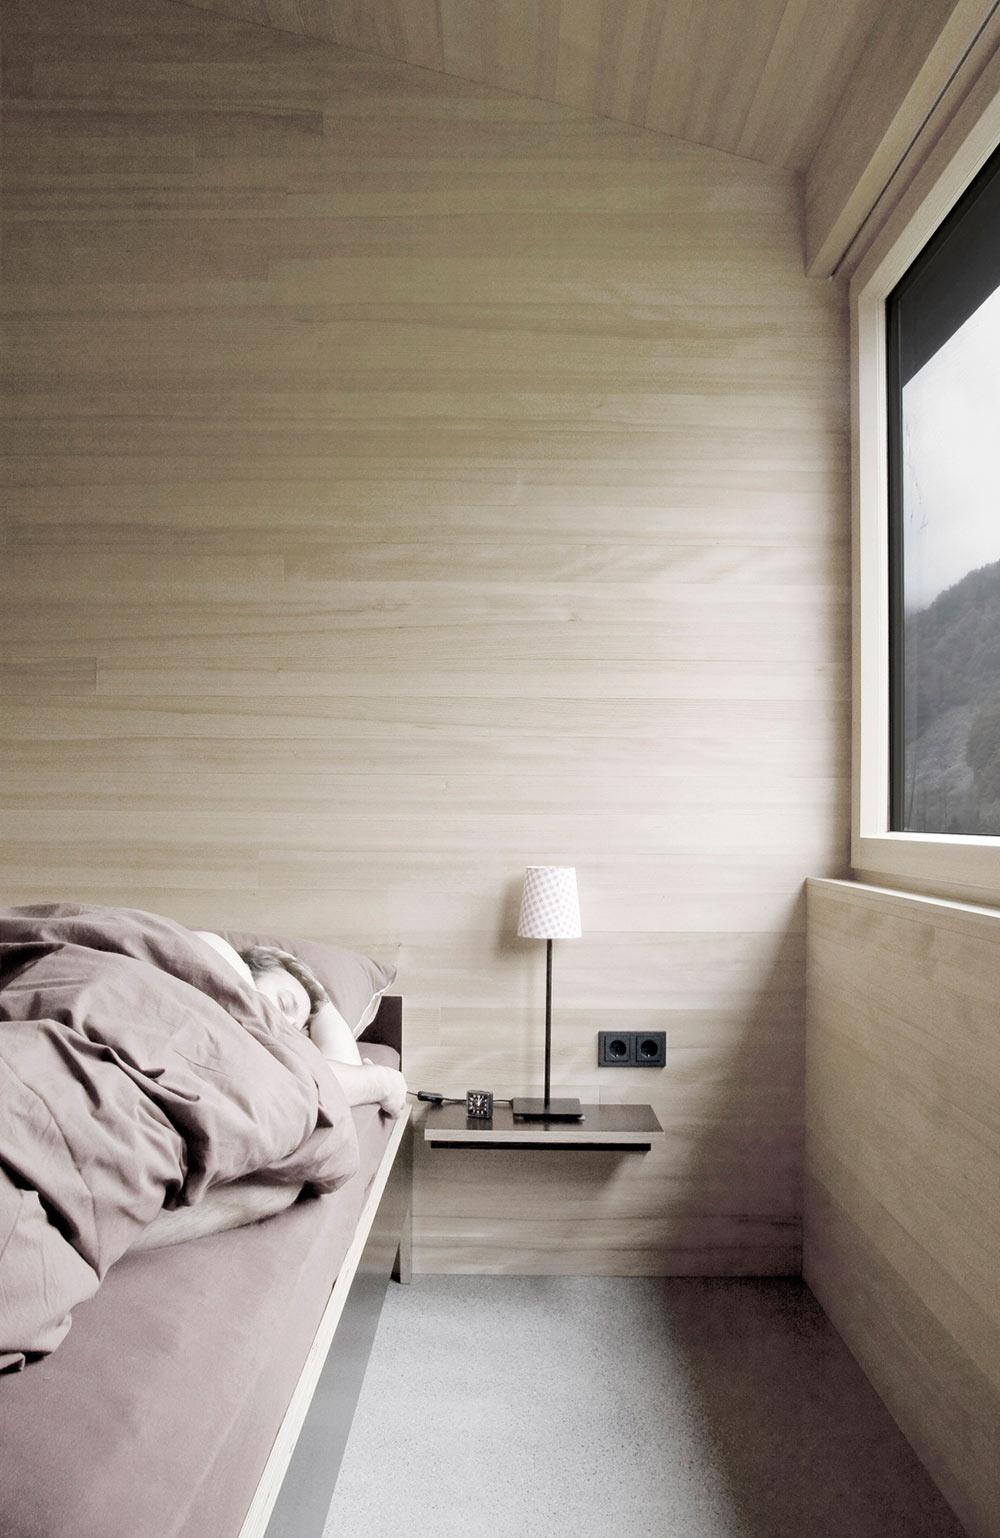 Bedroom, House for Gudrun in Mellau, Austria